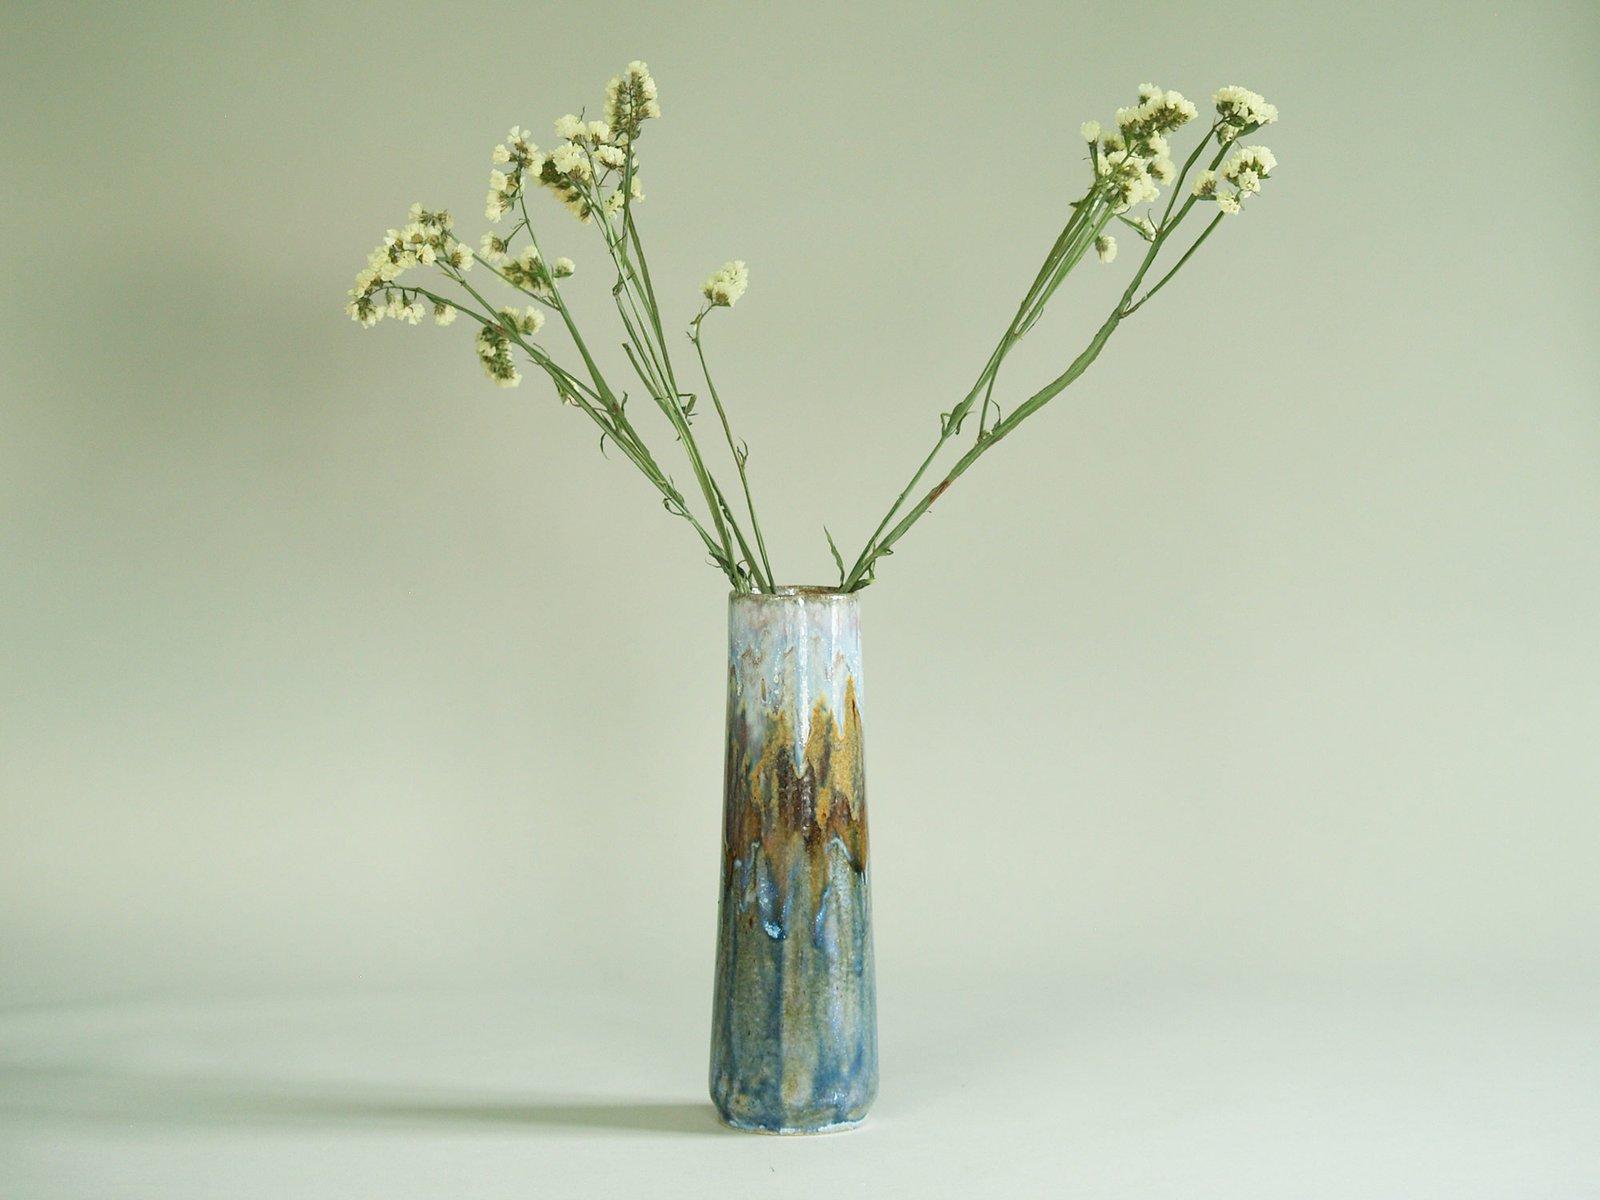 French art nouveau vase by gentil bourdet 1920 for sale at pamono reviewsmspy